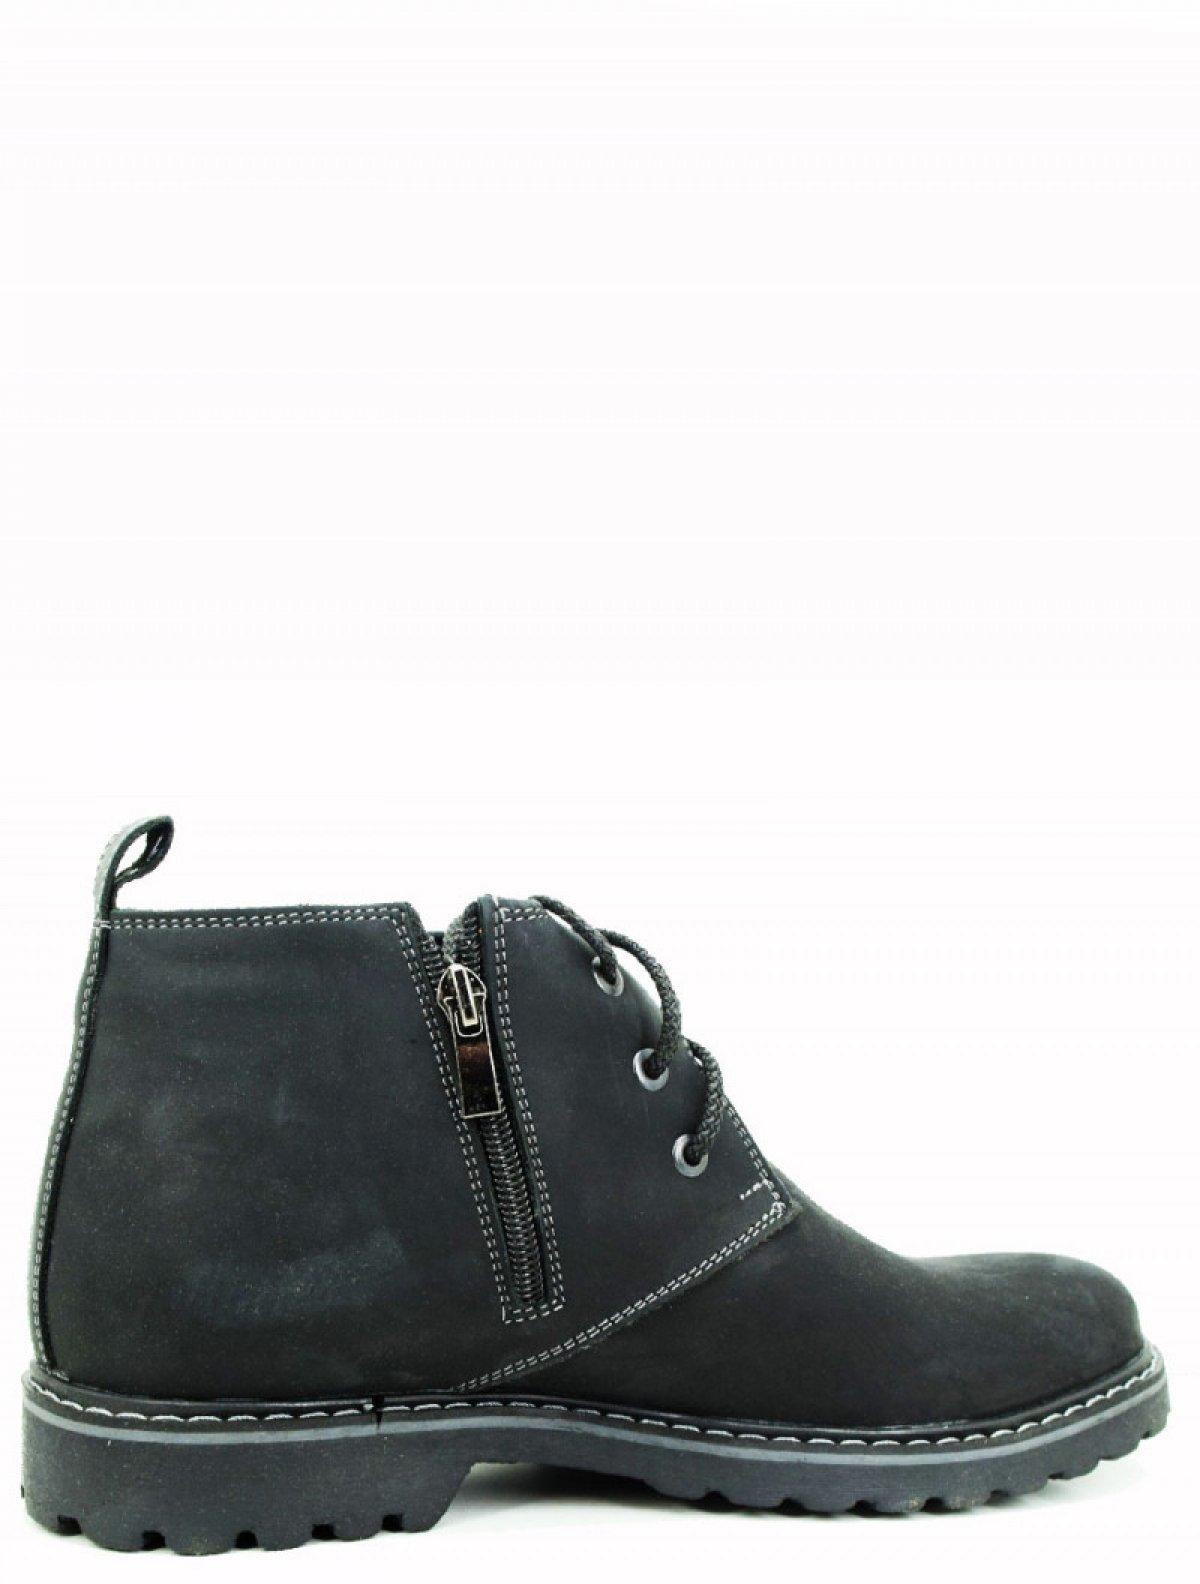 Baratto 5-239-007-2 мужские ботинки